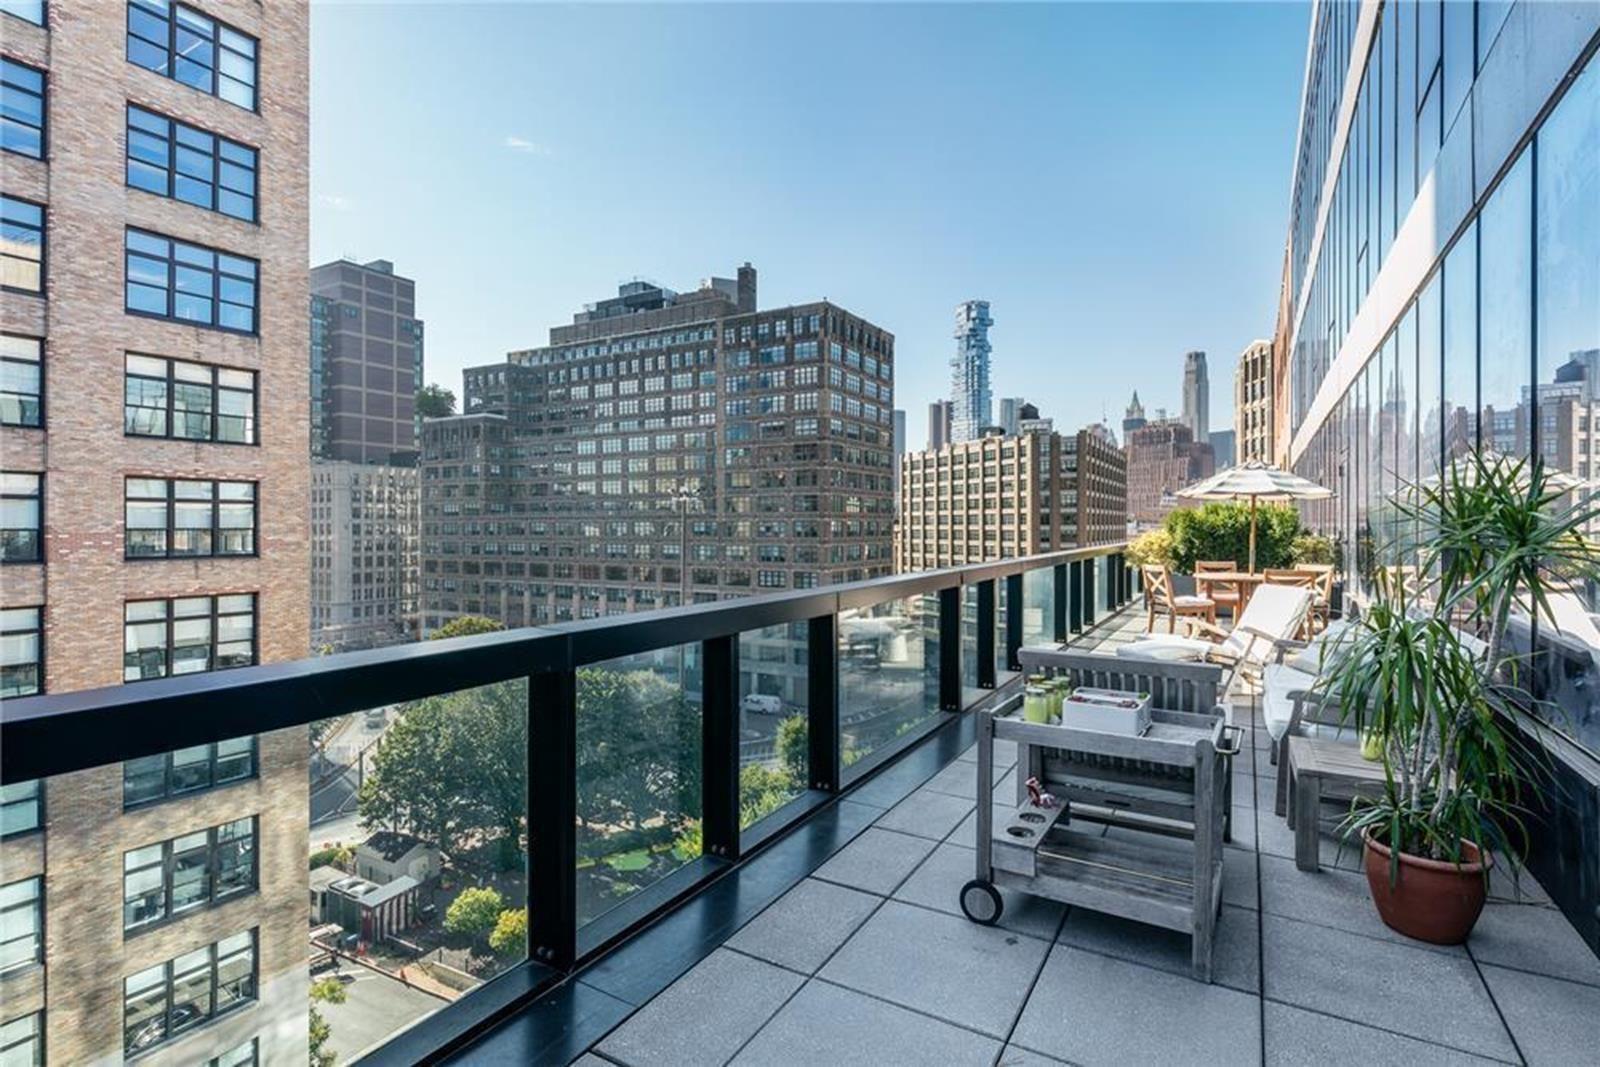 Apartment for sale at 255 Hudson Street, Apt 9-E